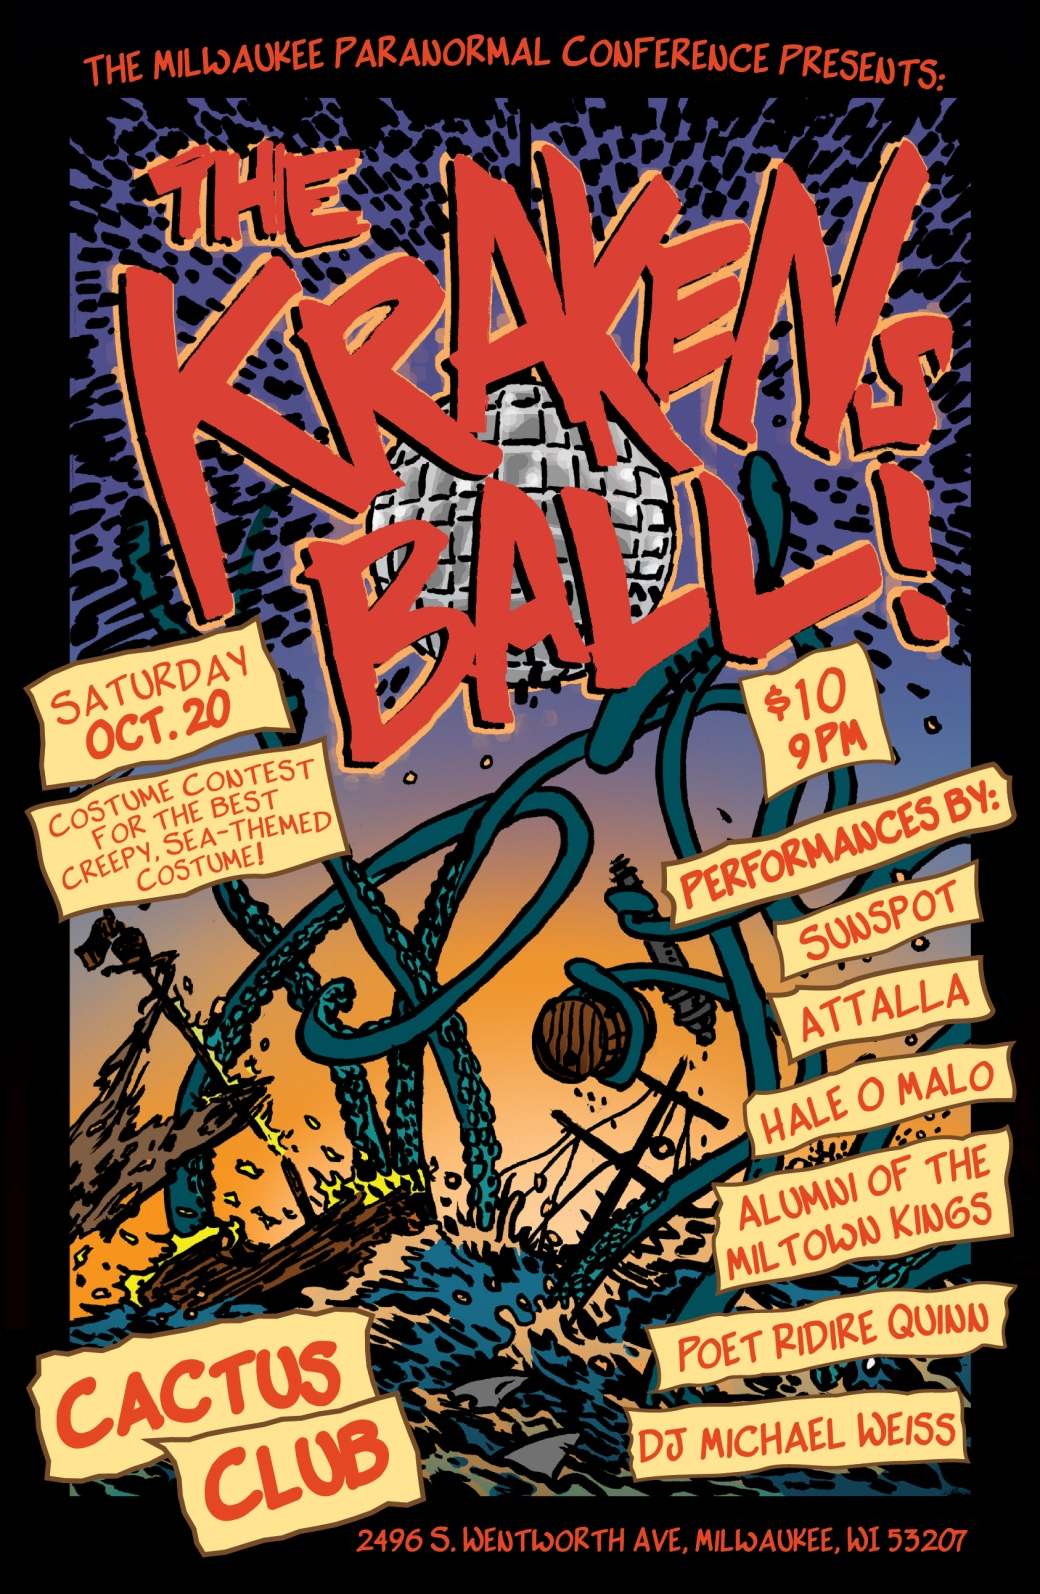 KrakensBall_Poster_DBeyerJrWEB.jpg